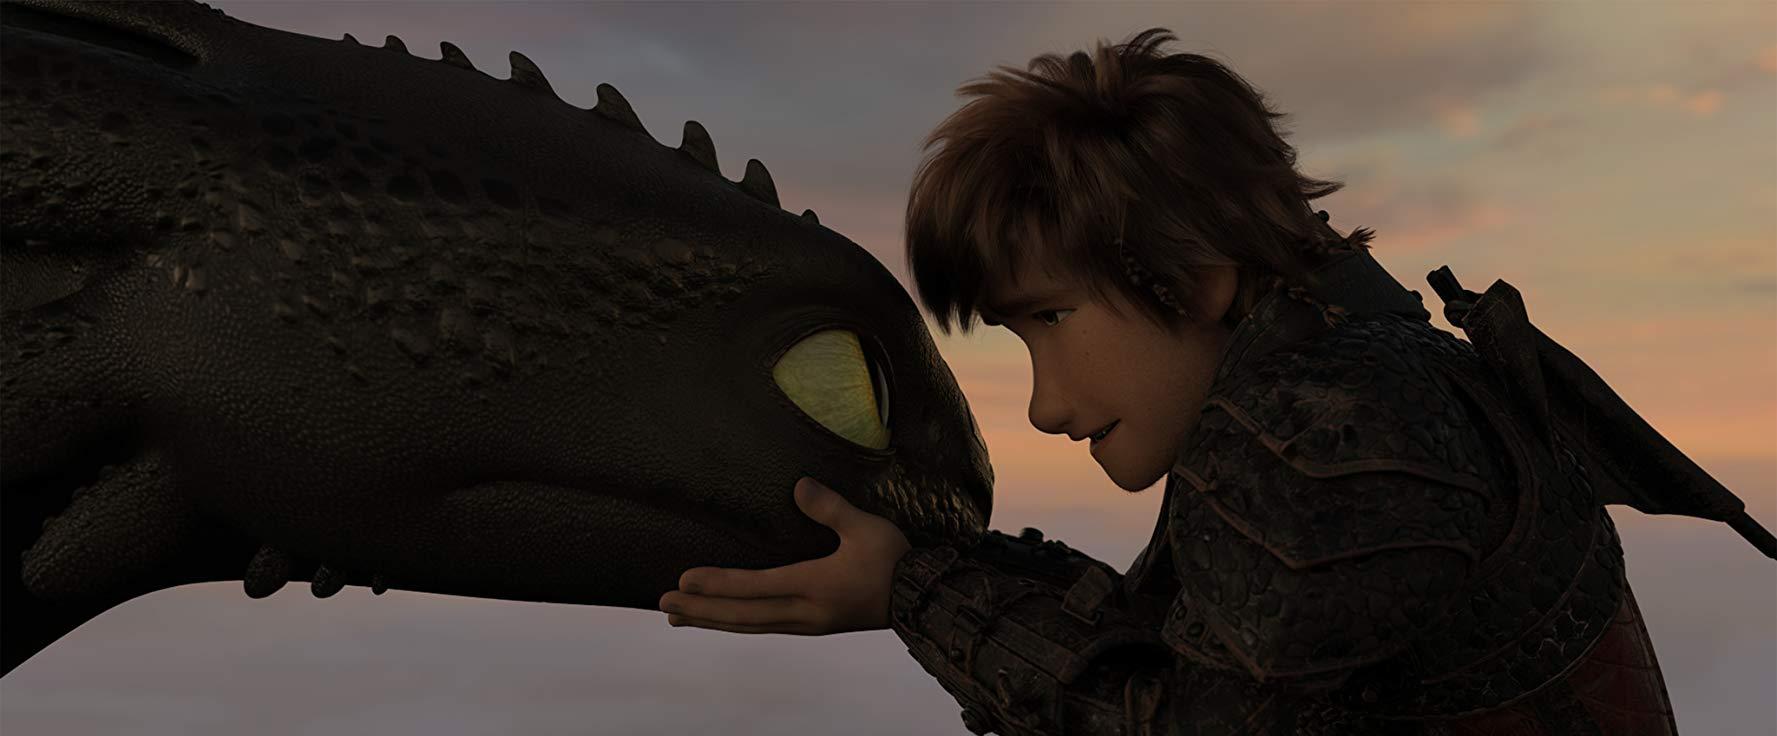 Dragon Trainer The hidden world